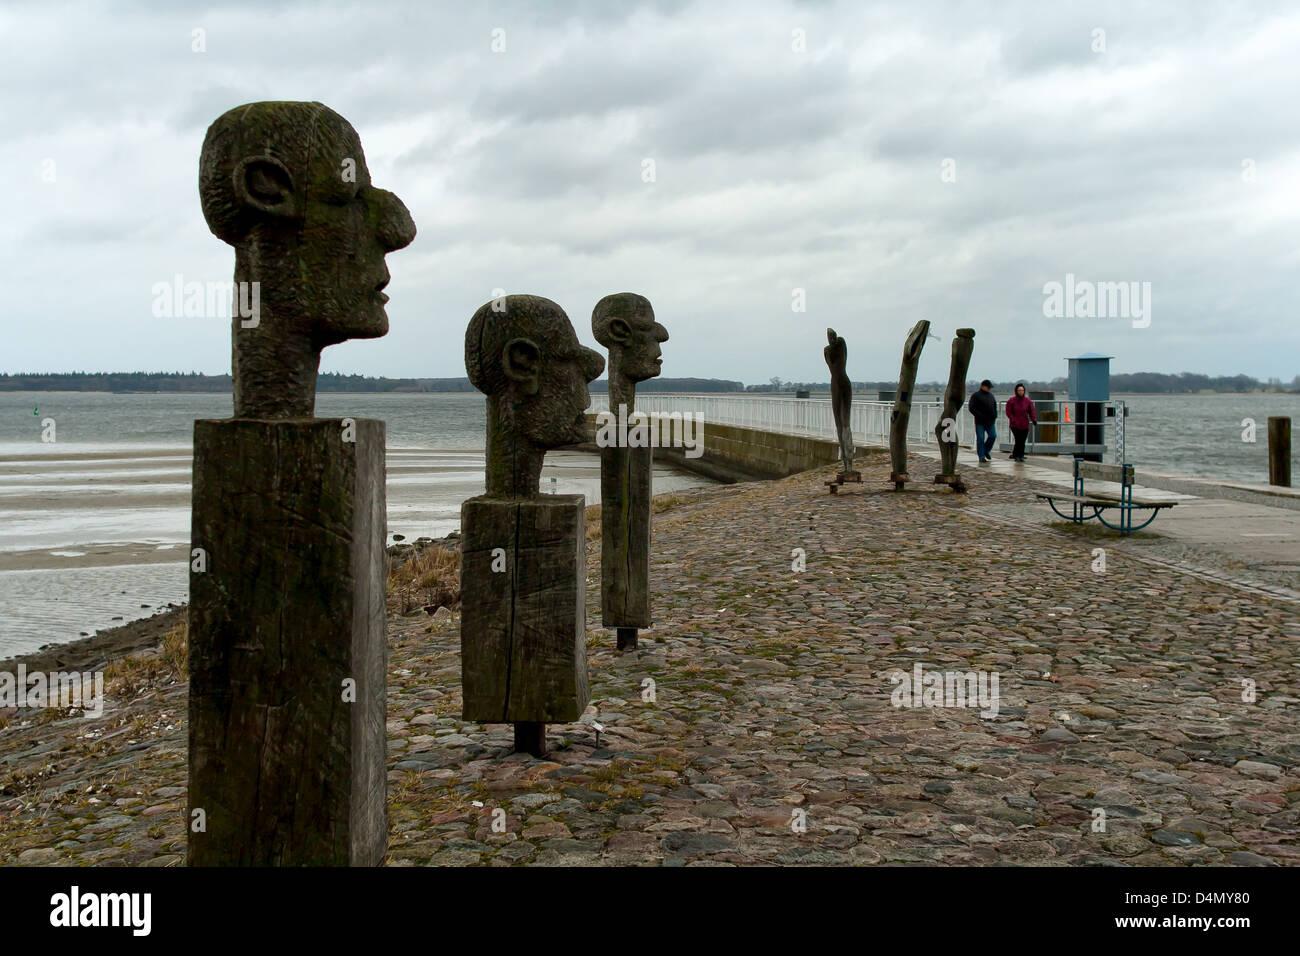 Greifswald, Germany, wooden sculptures at the Danish unions Wiek - Stock Image